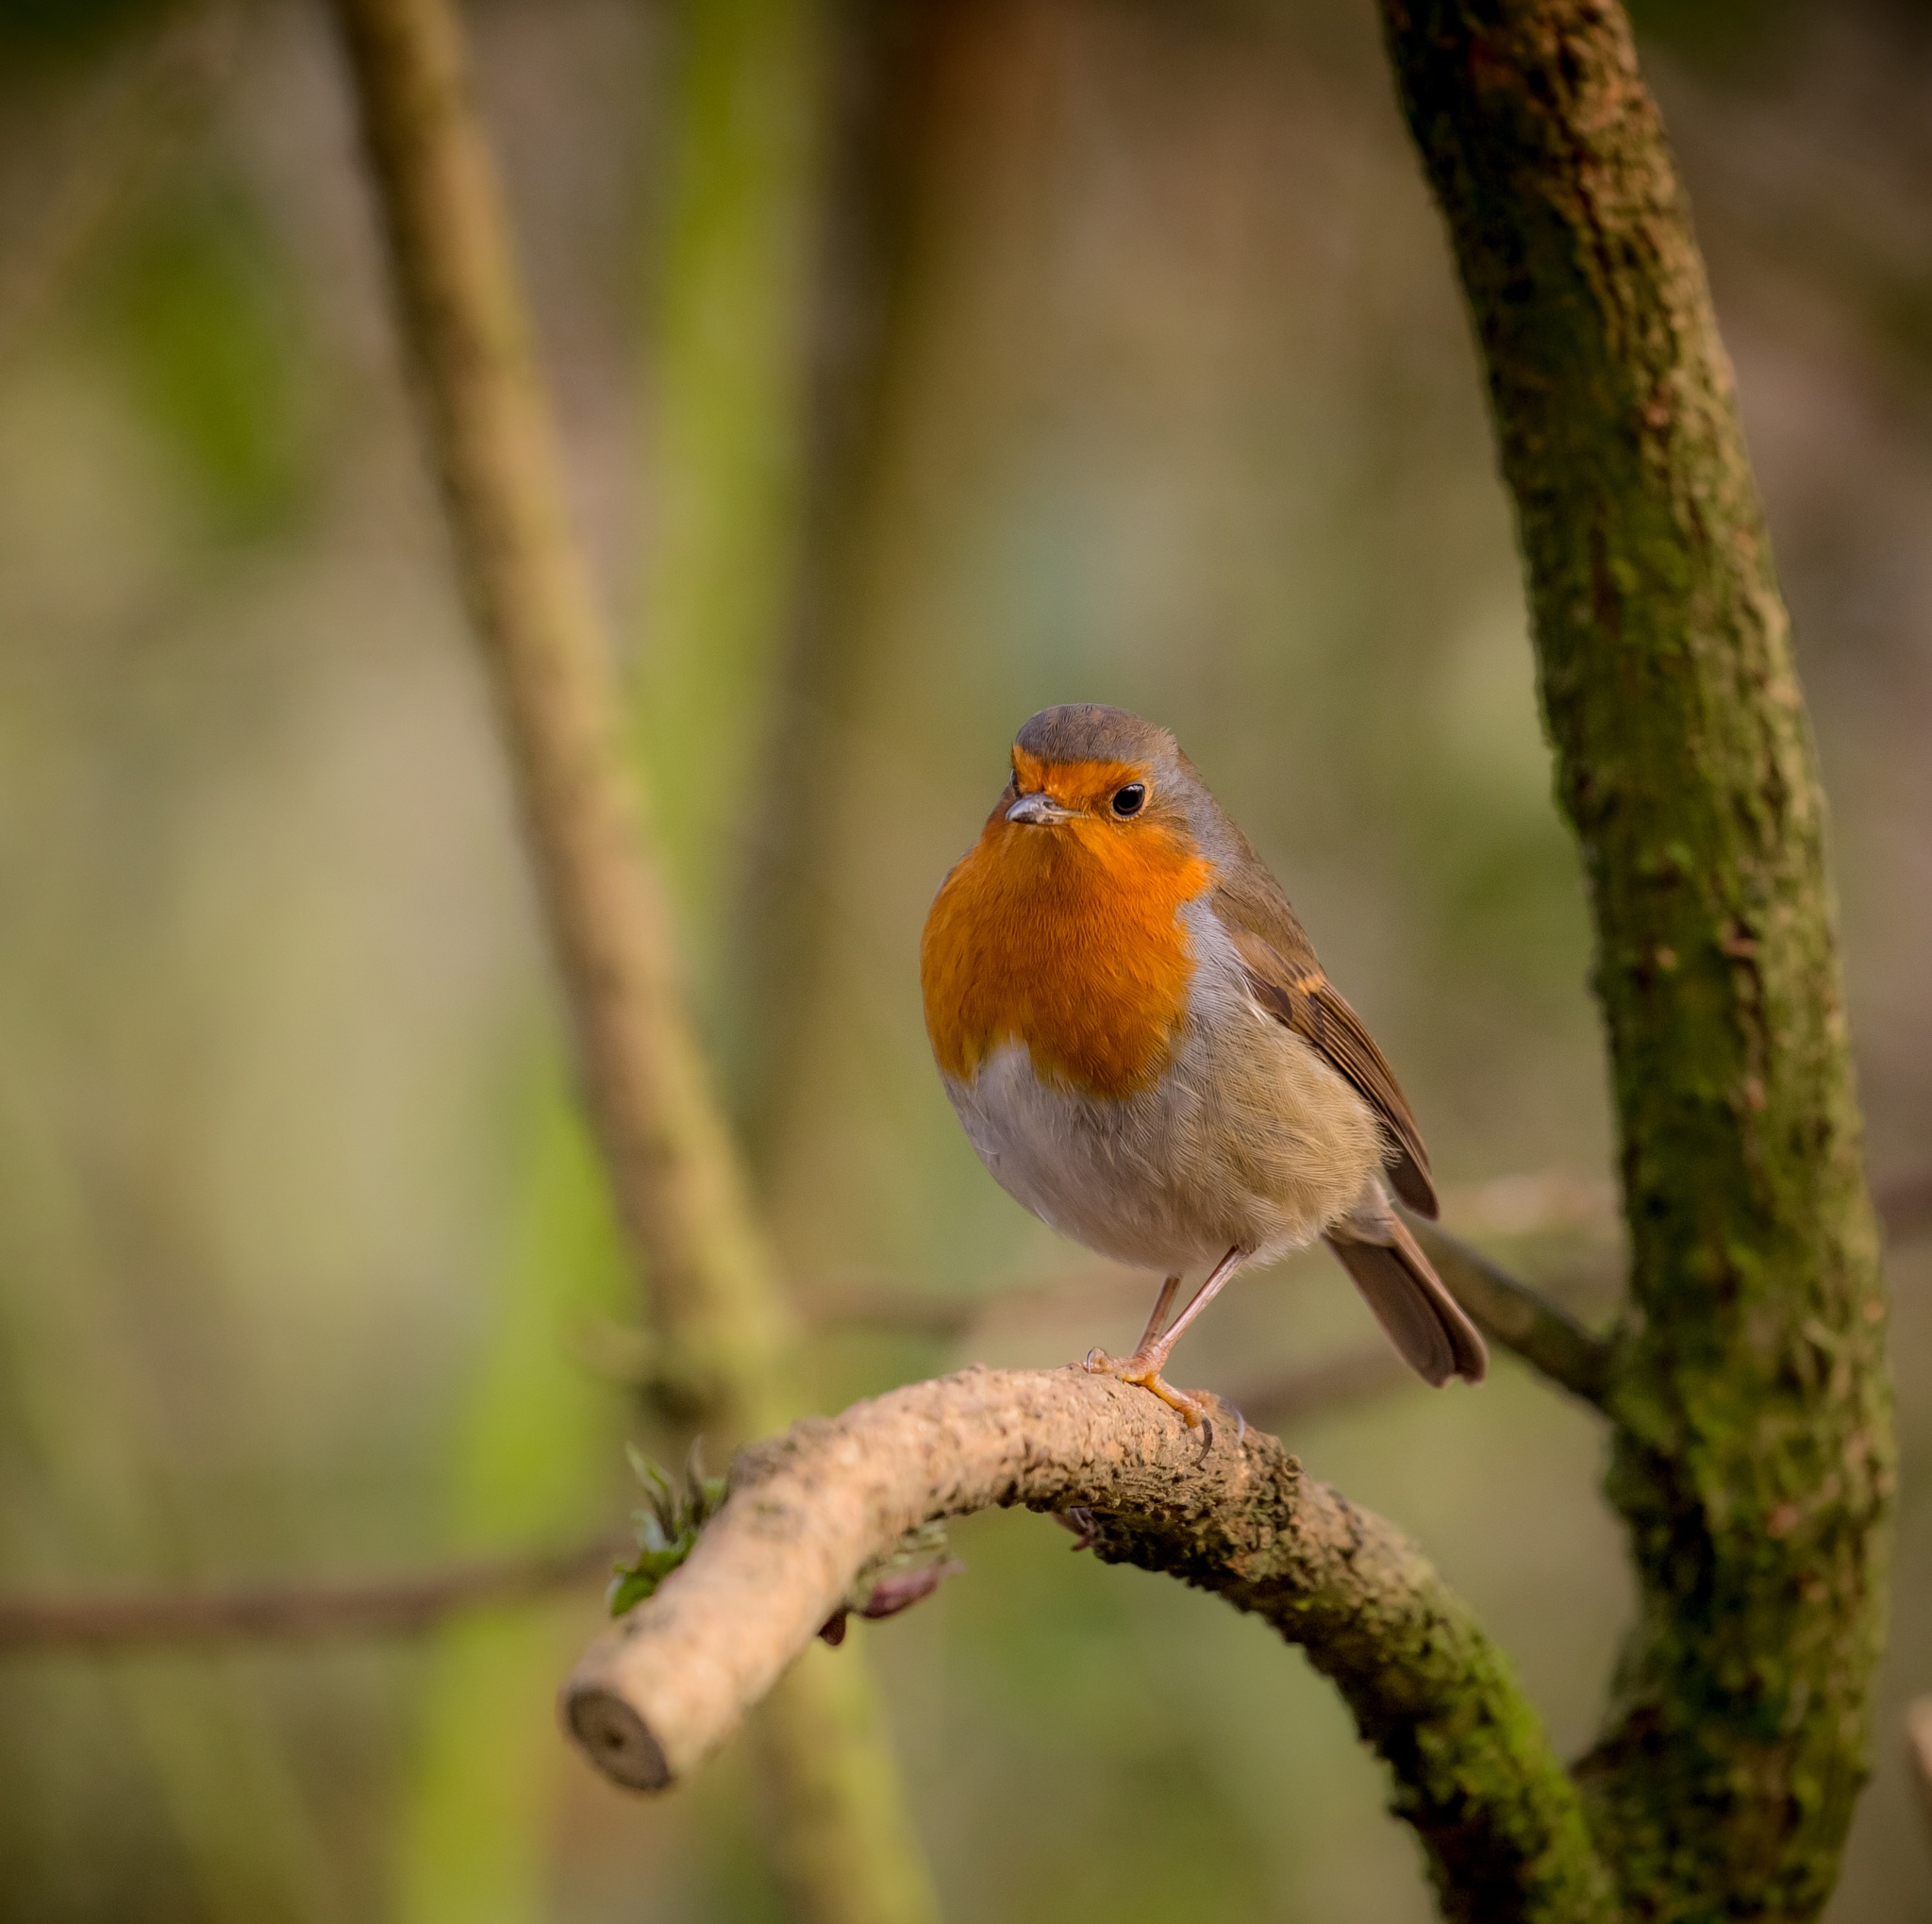 Robin by Sarah Walters